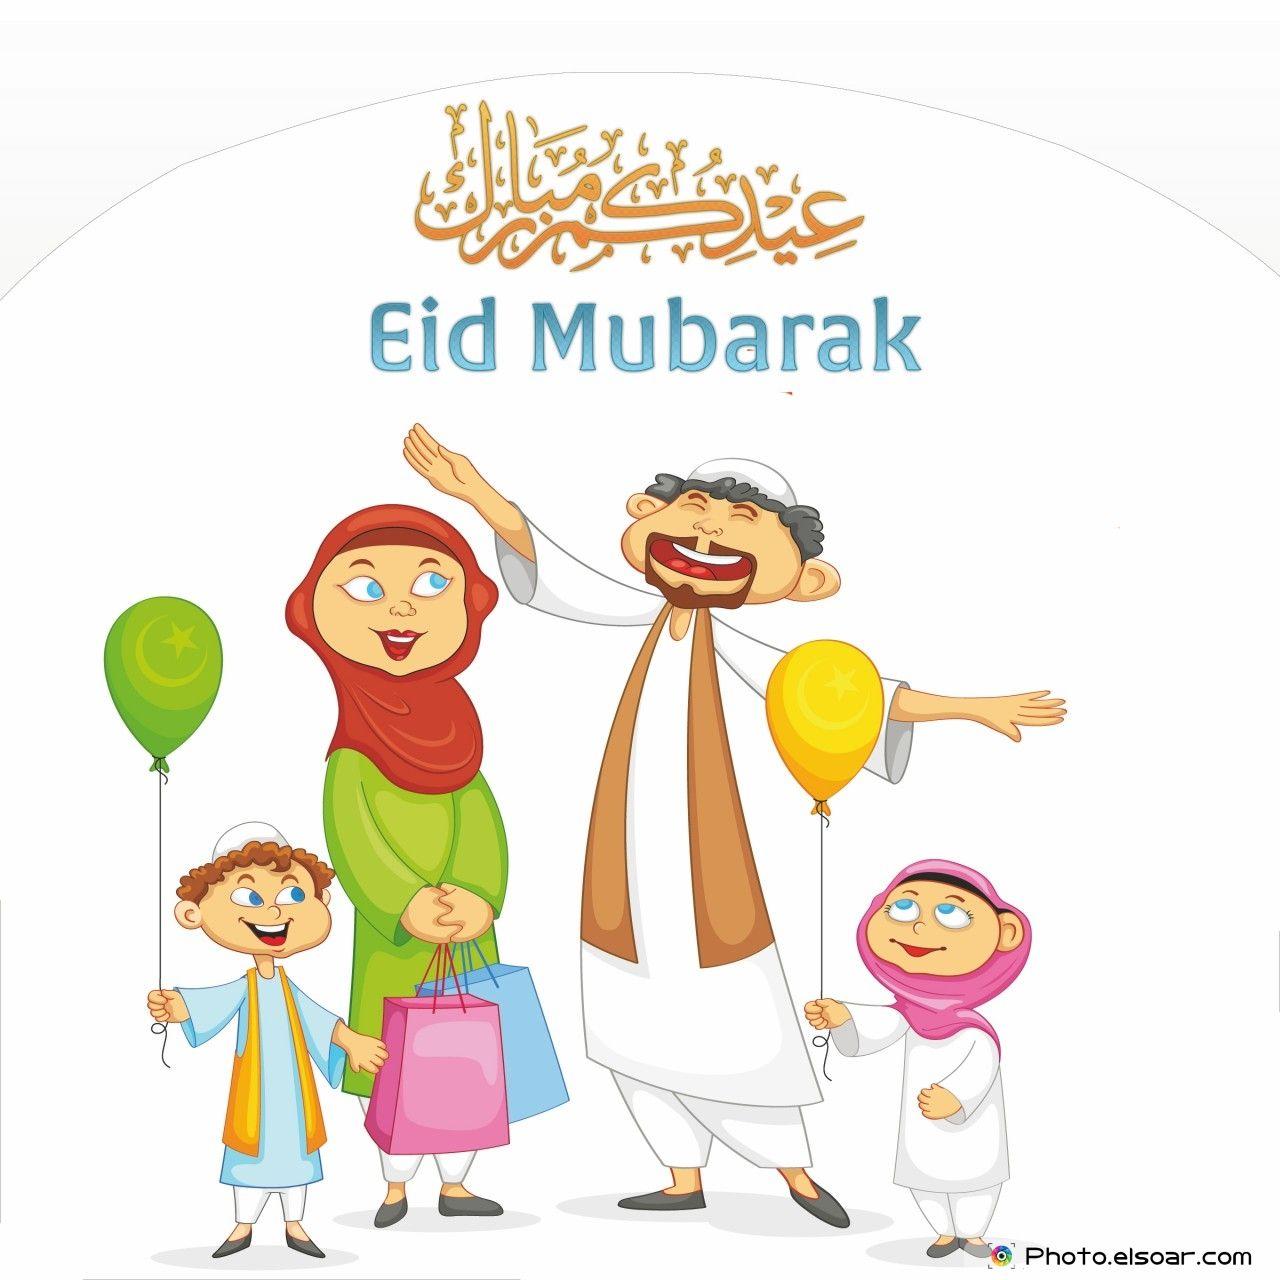 Eid Mubarak with a Muslim family Islamic Pinterest